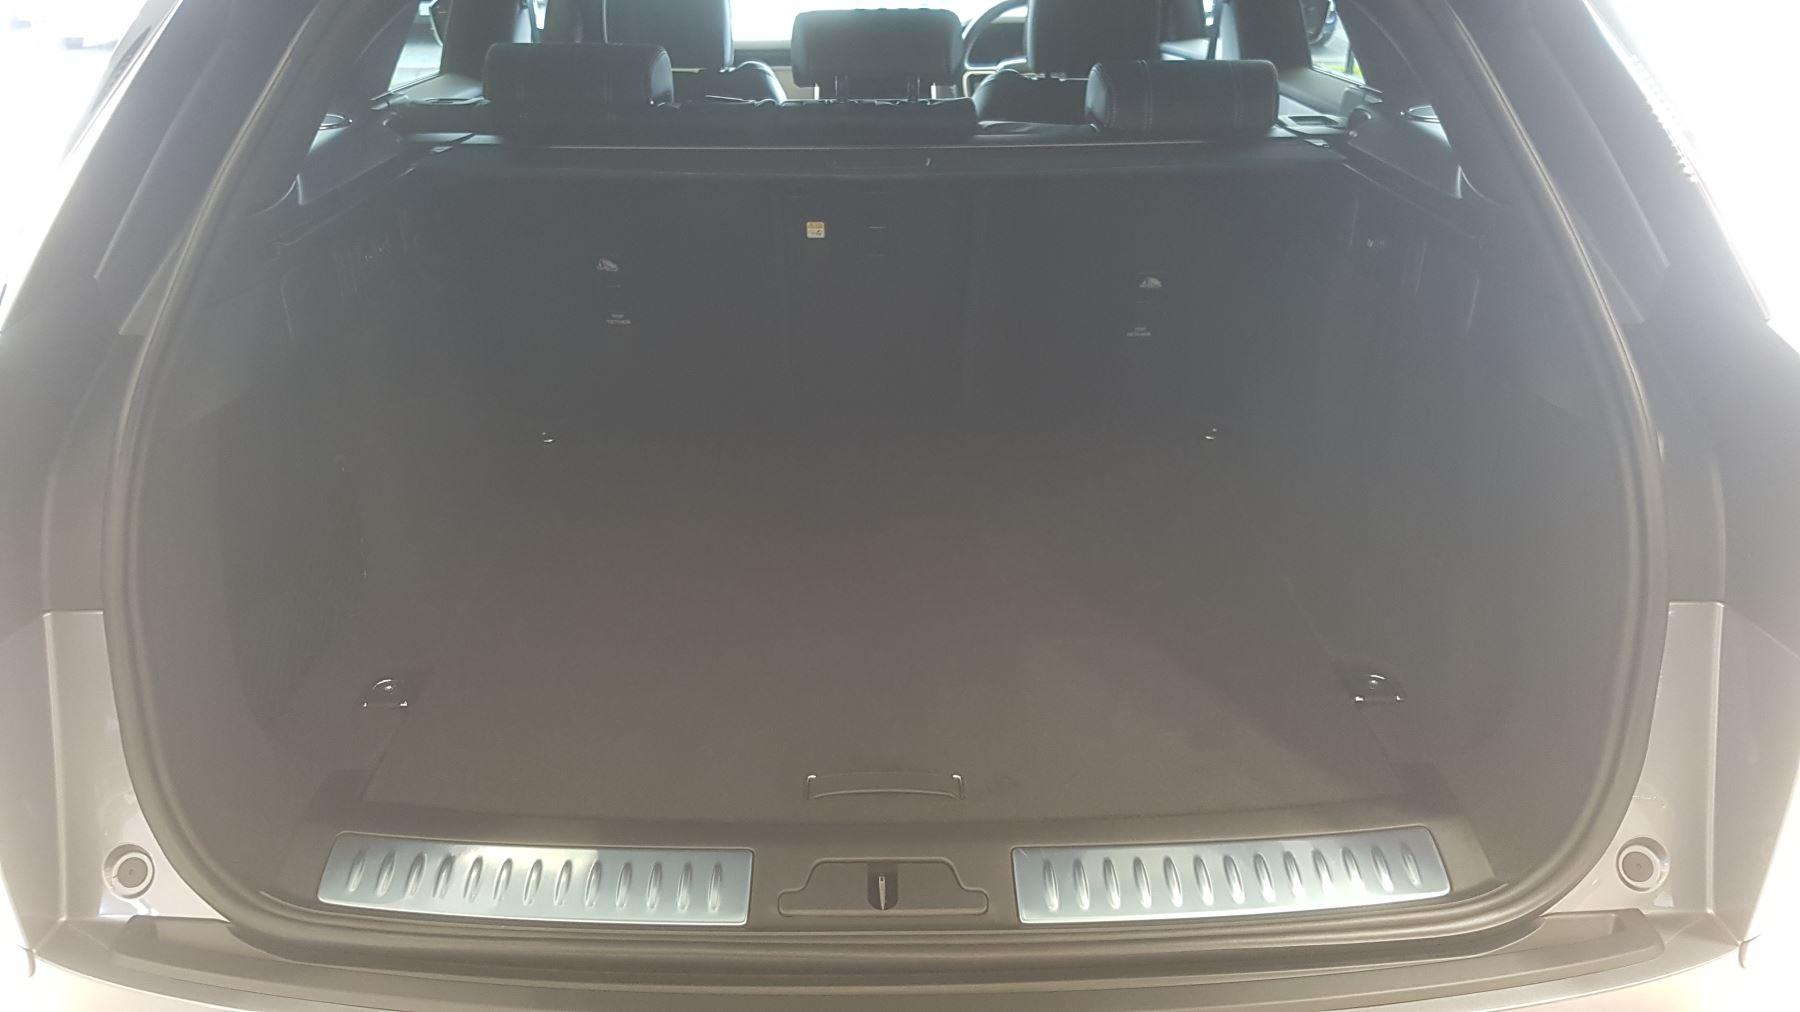 Land Rover Range Rover Velar 3.0 P400 R-Dynamic HSE image 12